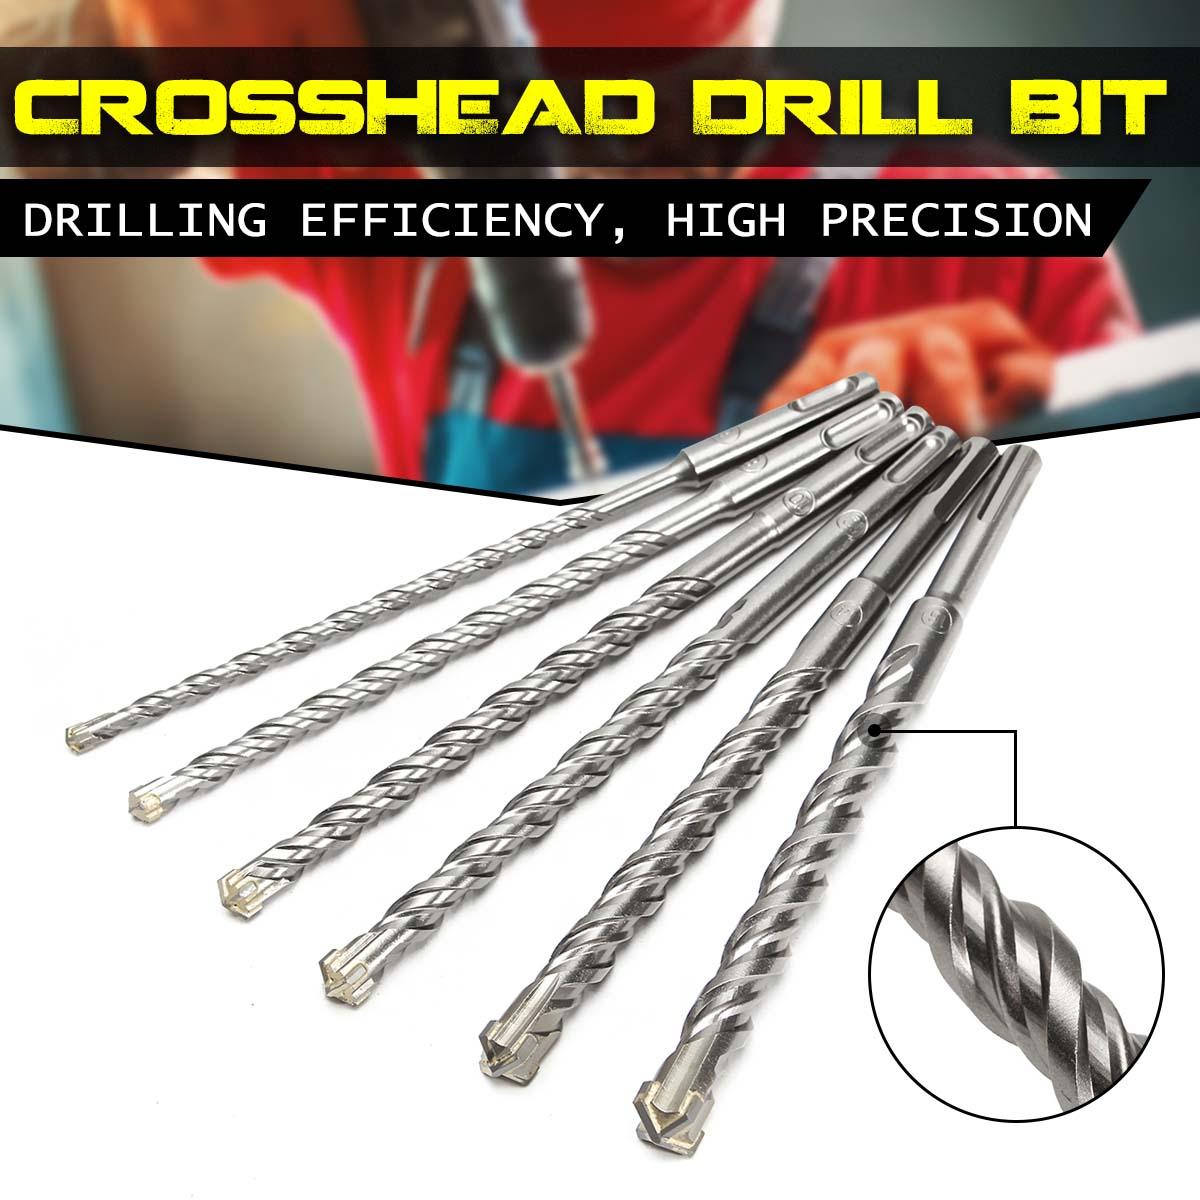 Concrete Tungsten Carbide Tip 210mm SDS Plus Crosshead Drill Bits Carbide Twin Spiral Drilling Efficiency High Precision Durable